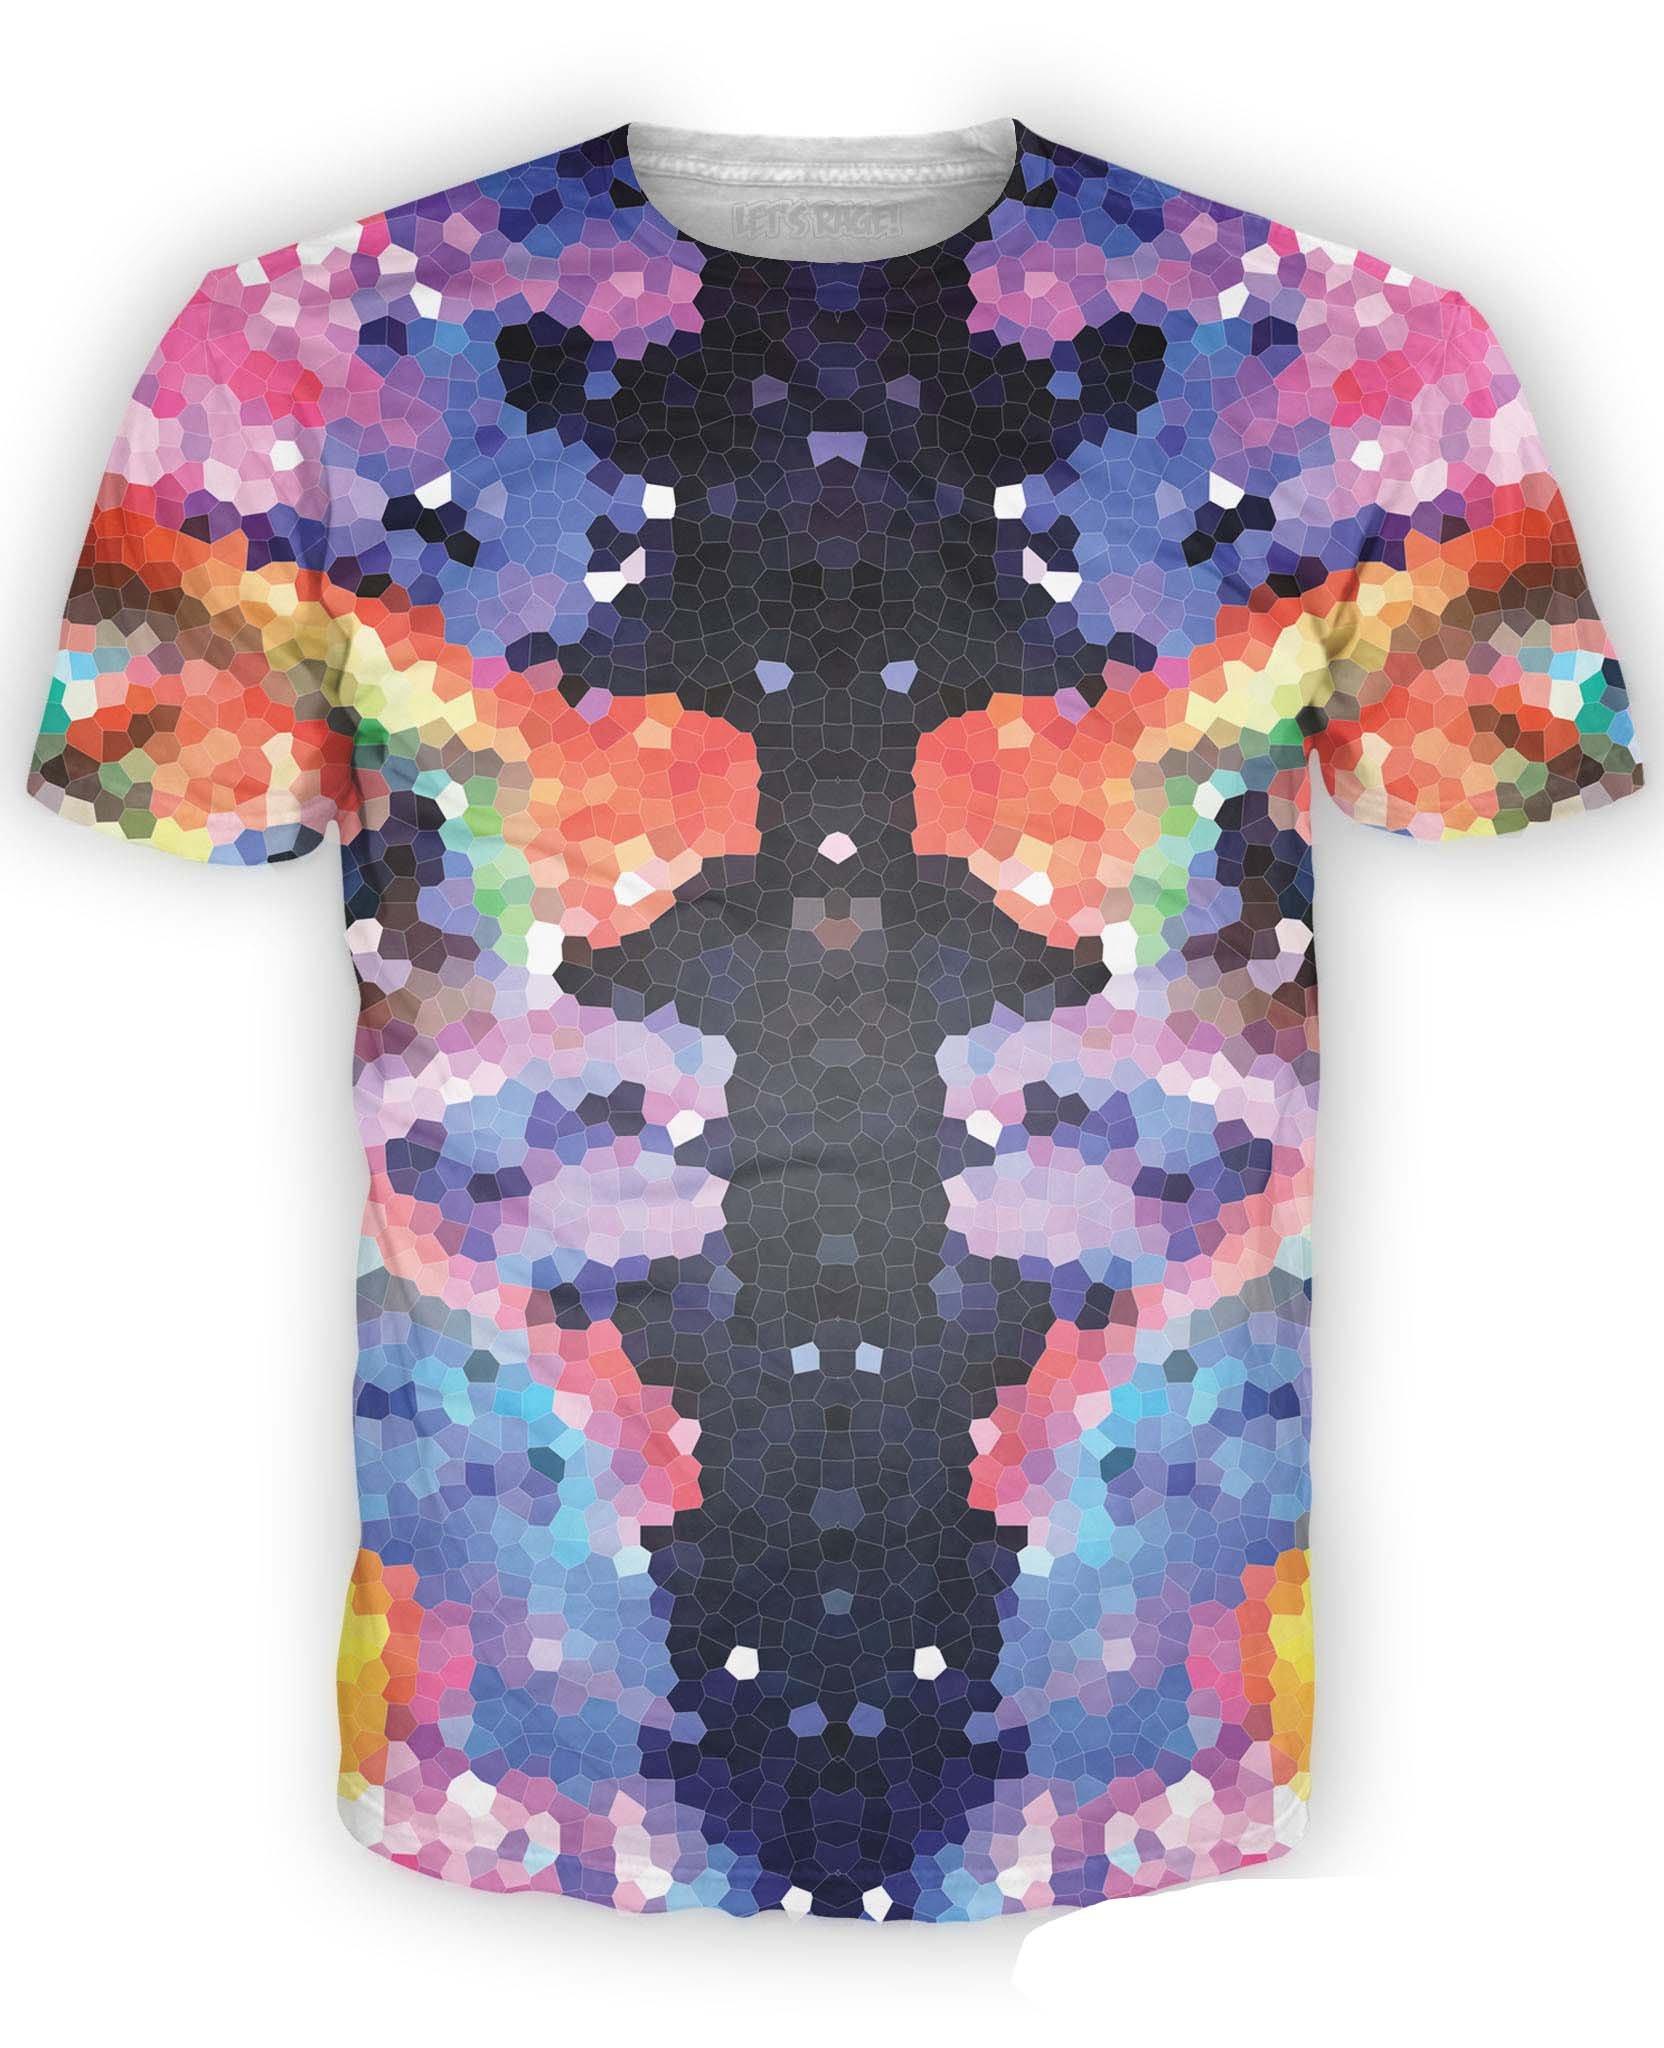 Crystal Symmetry Tee Shirt